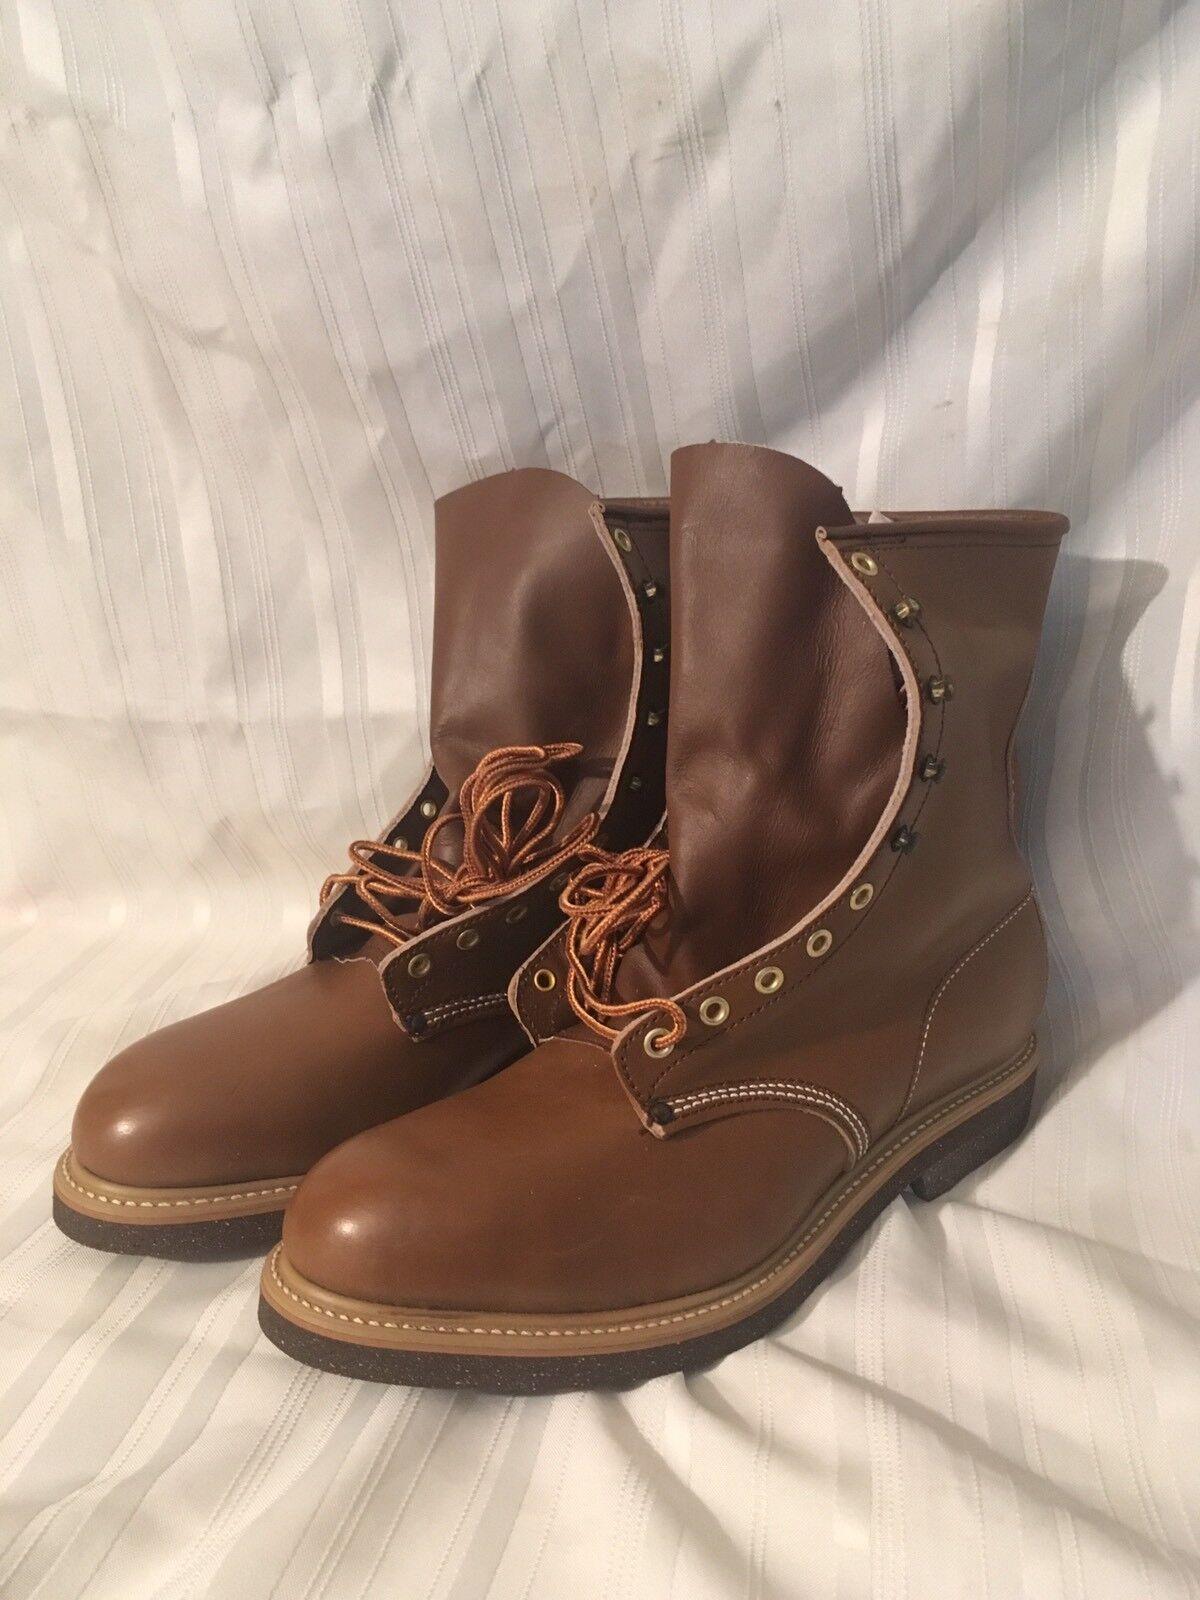 Vtg Hytest High Ankle braun Work Stiefel Steel Toe Sz 9.5 New Old Stock